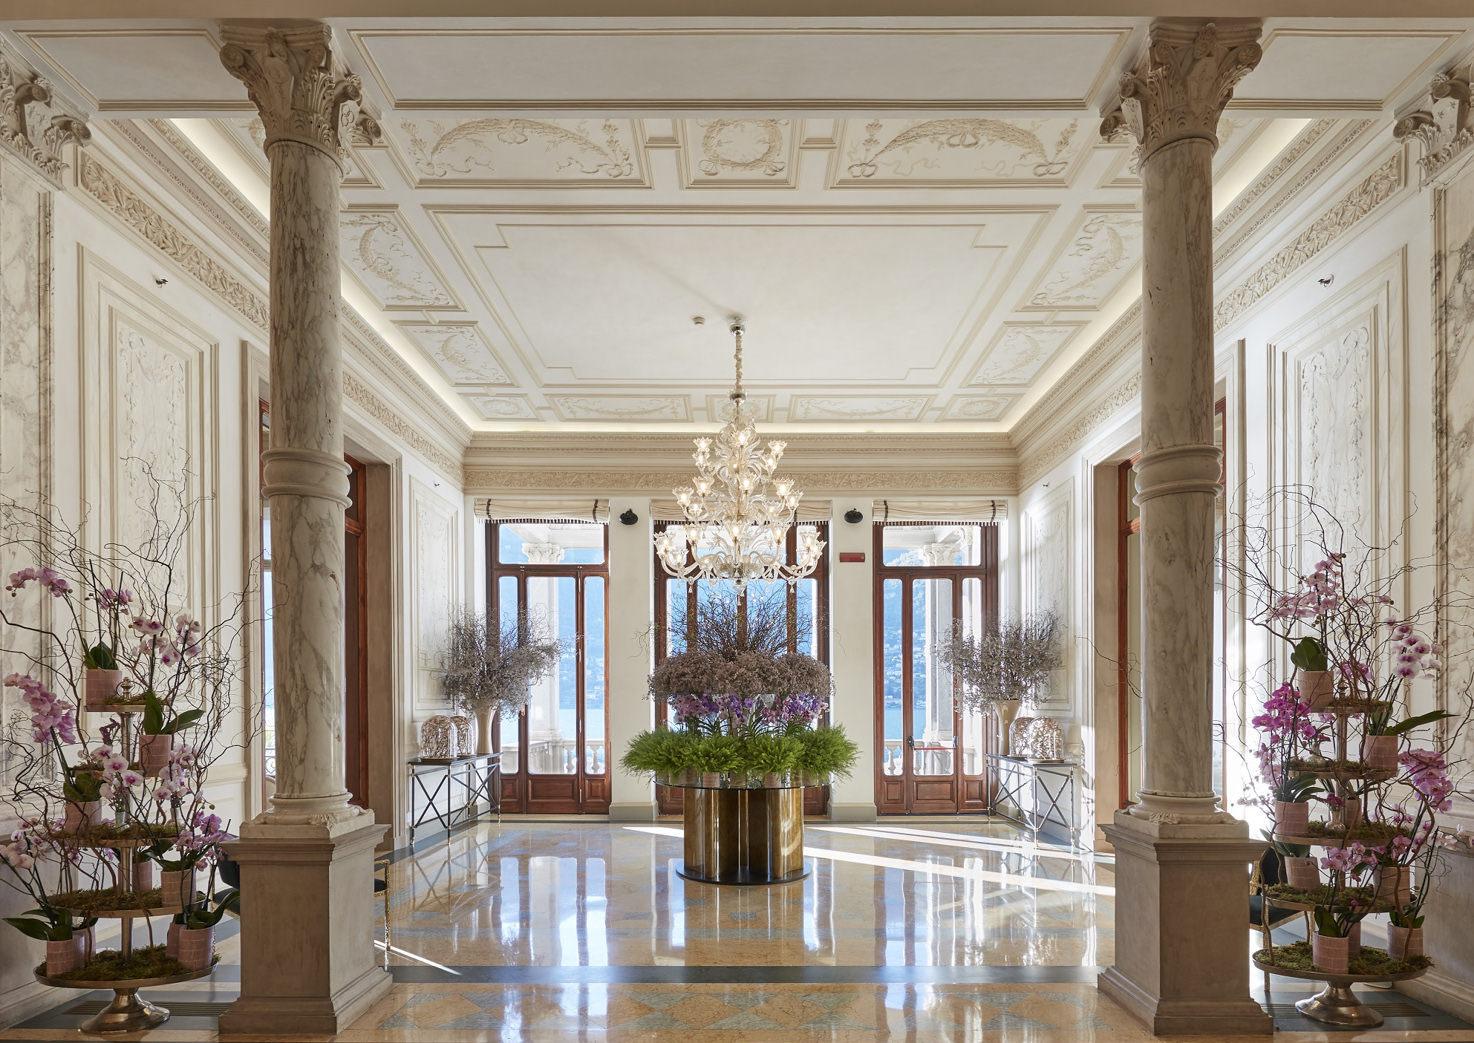 Lobby of Mandarin Oriental